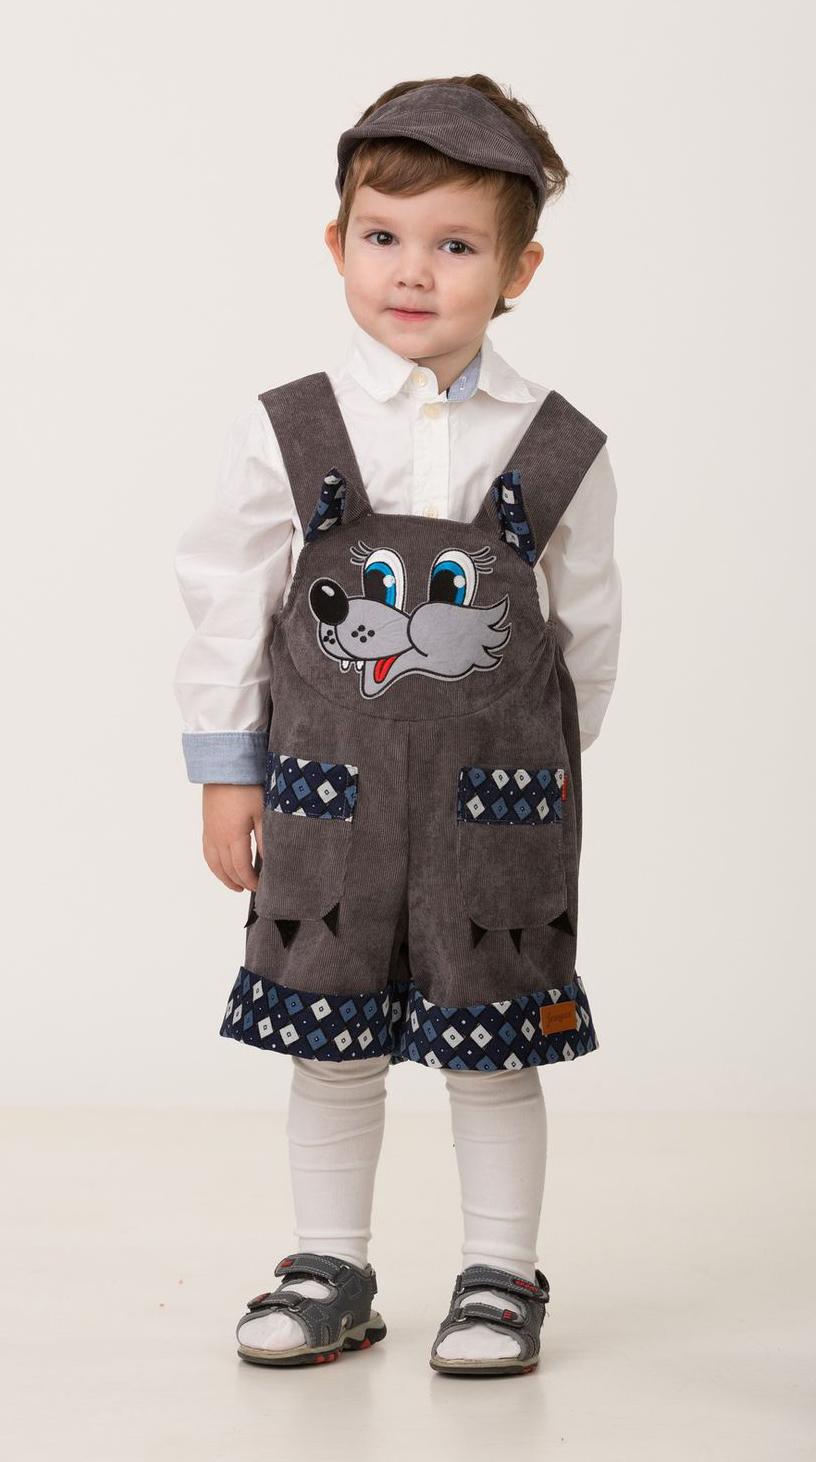 Карнавальный костюм Jeanees Волчонок Крепыш, цвет: тёмно-серый. Размер: 26 карнавальный костюм jeanees мышонок масик цвет серый размер 24